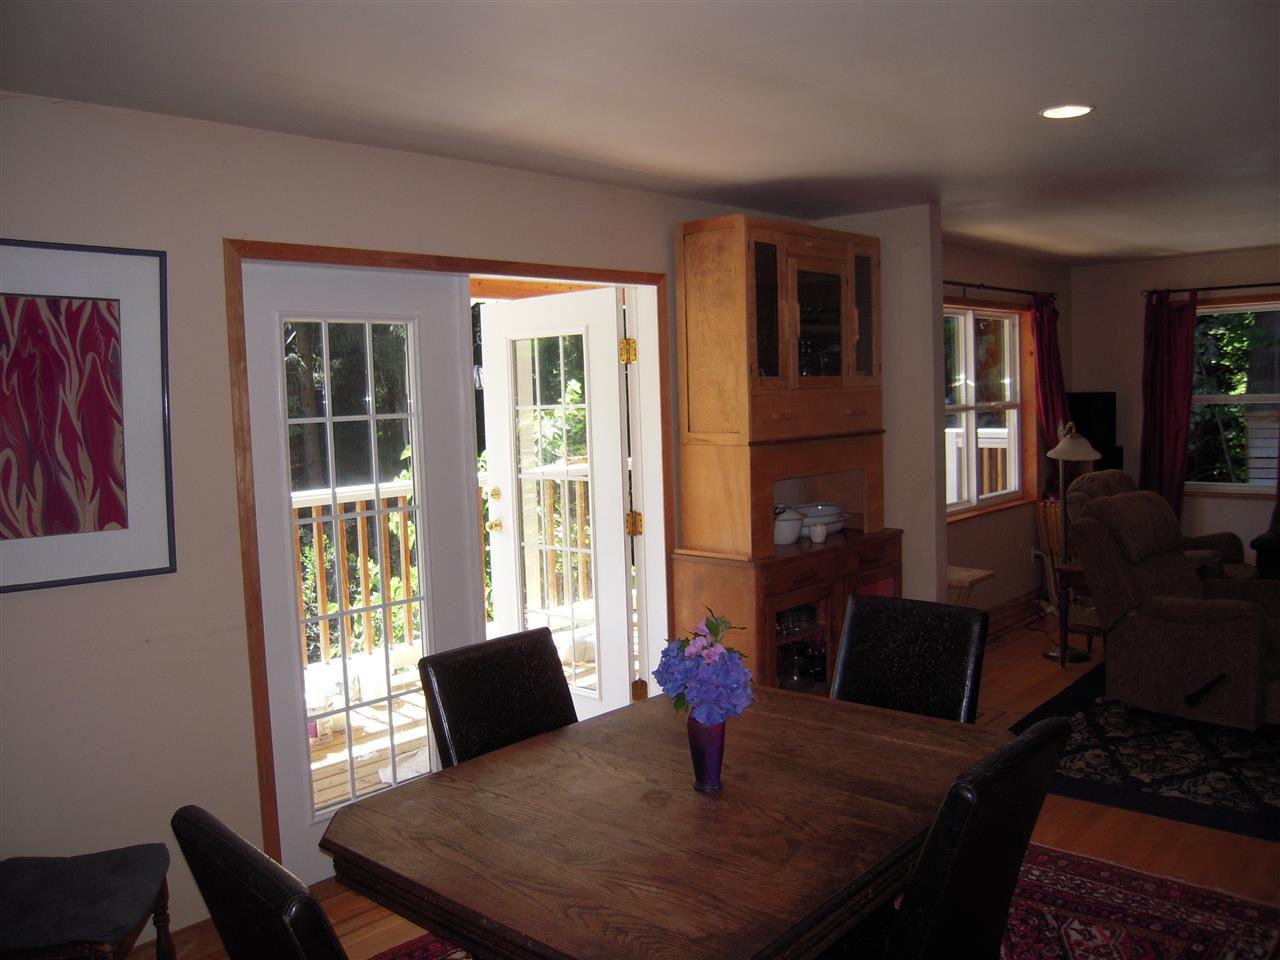 Photo 8: Photos: 2670 LOWER Road: Roberts Creek House for sale (Sunshine Coast)  : MLS®# R2096275